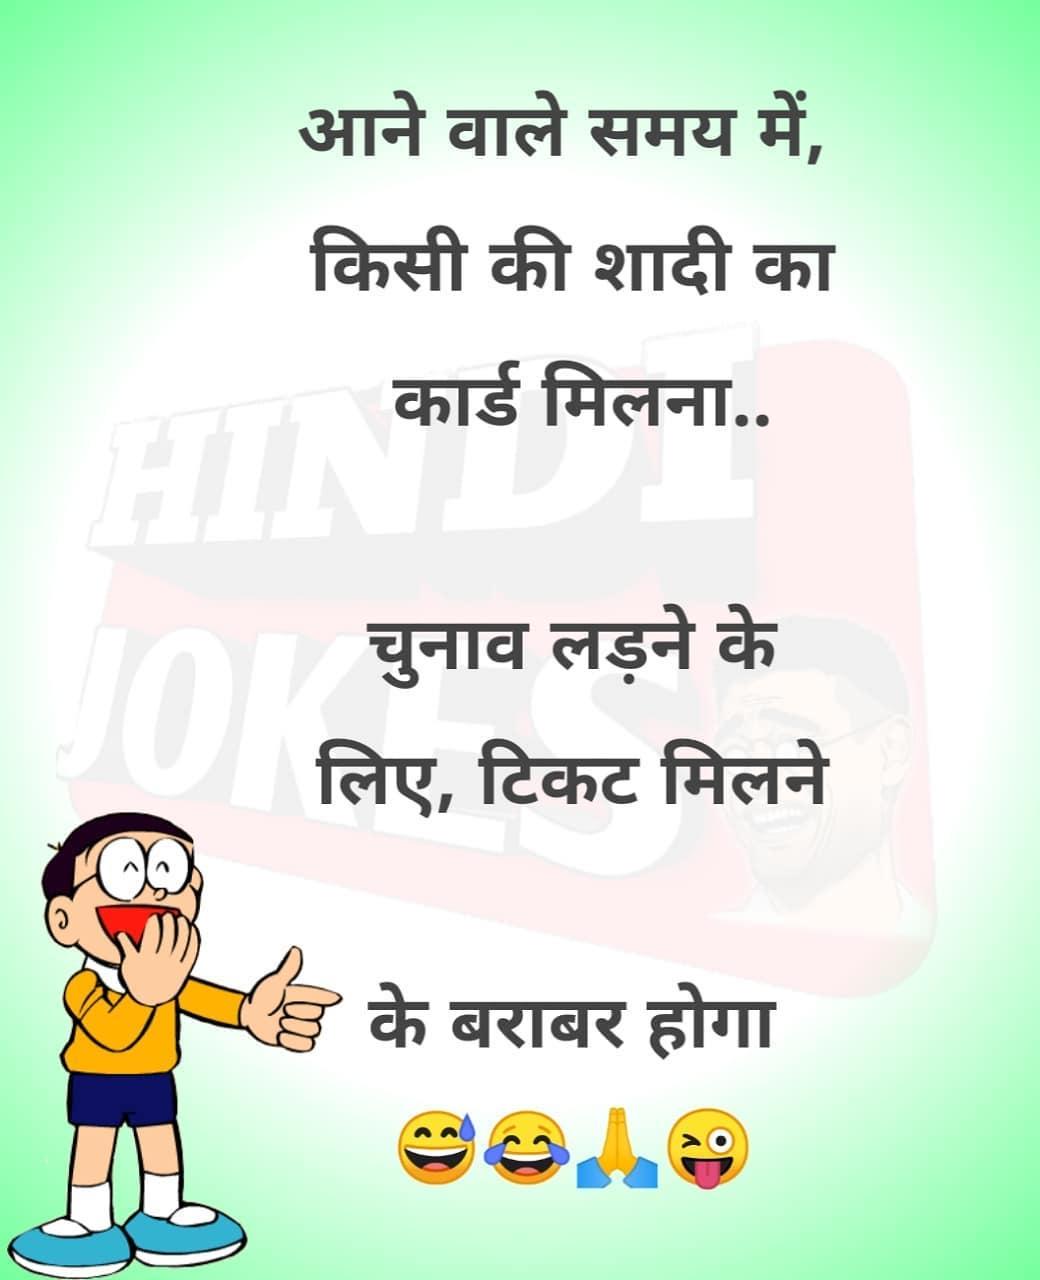 Funny jokes in Hindi 2020